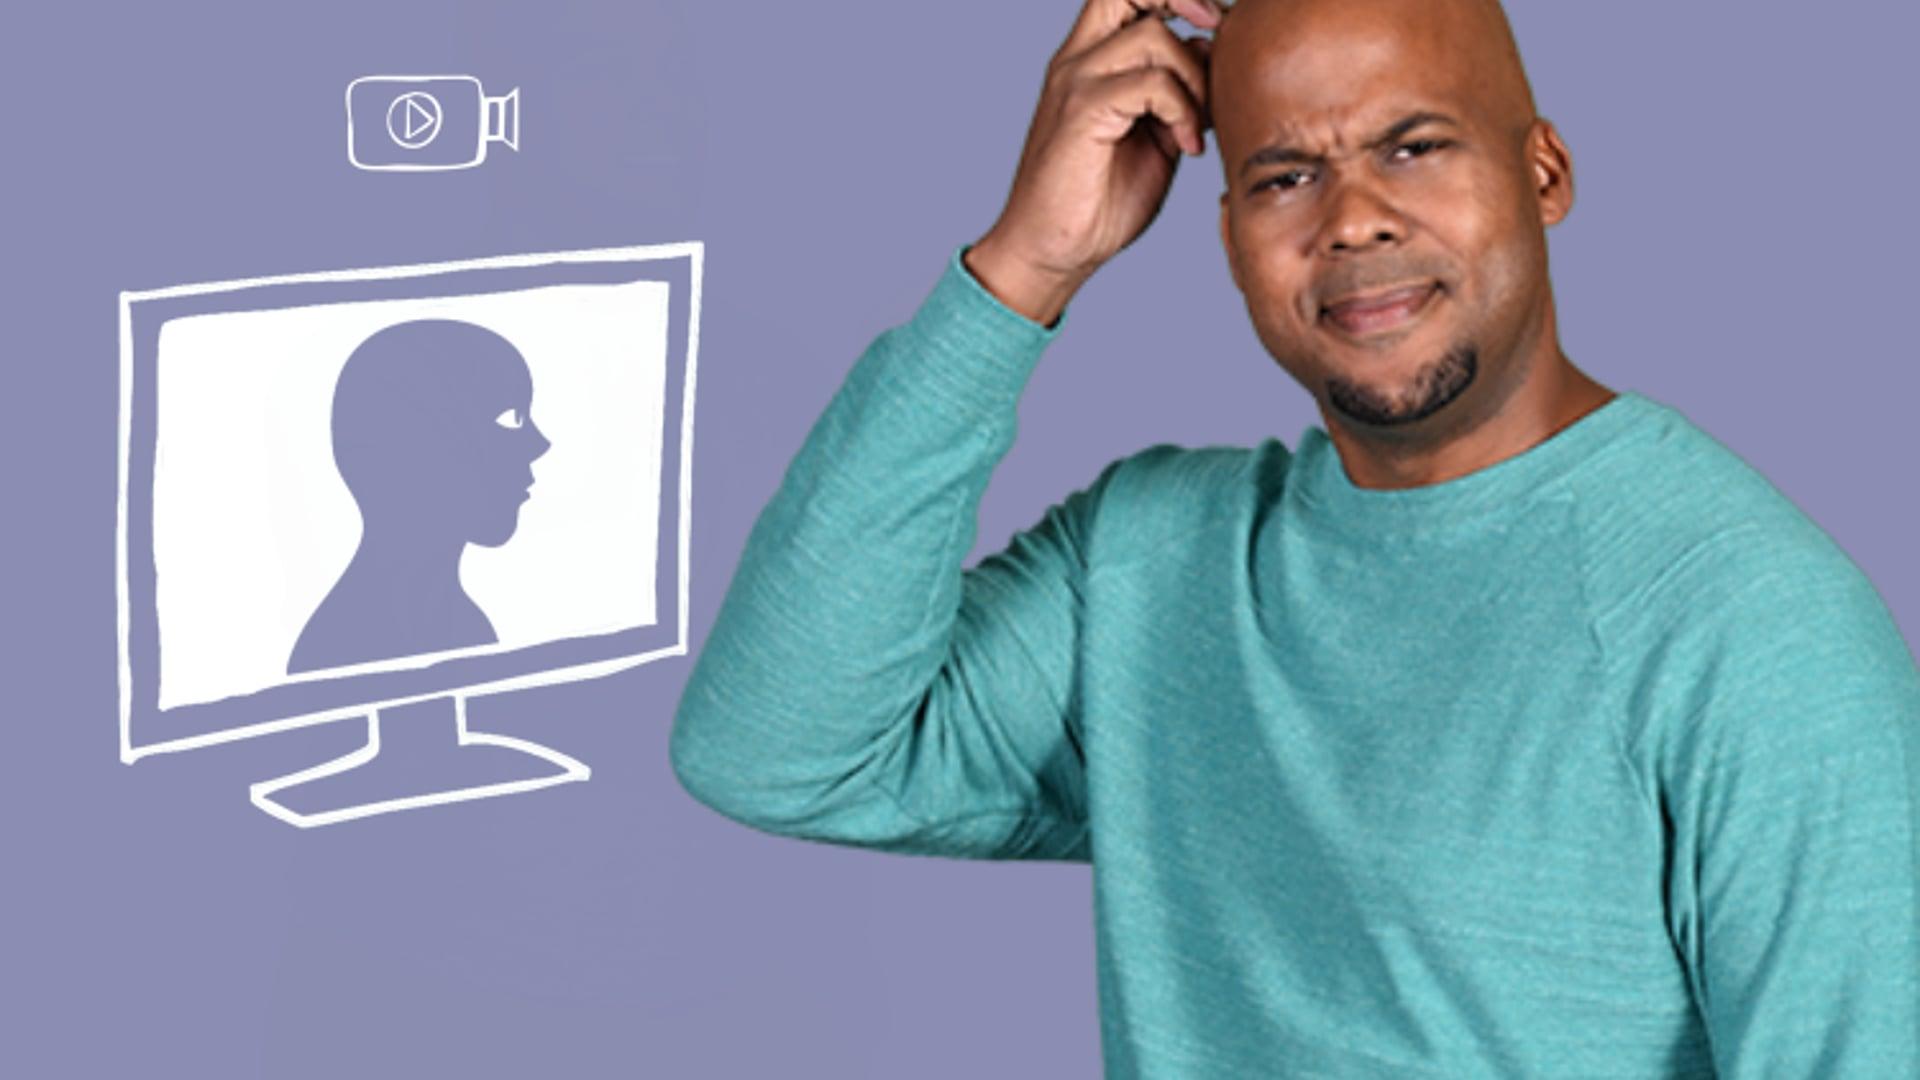 Effective Online Communications